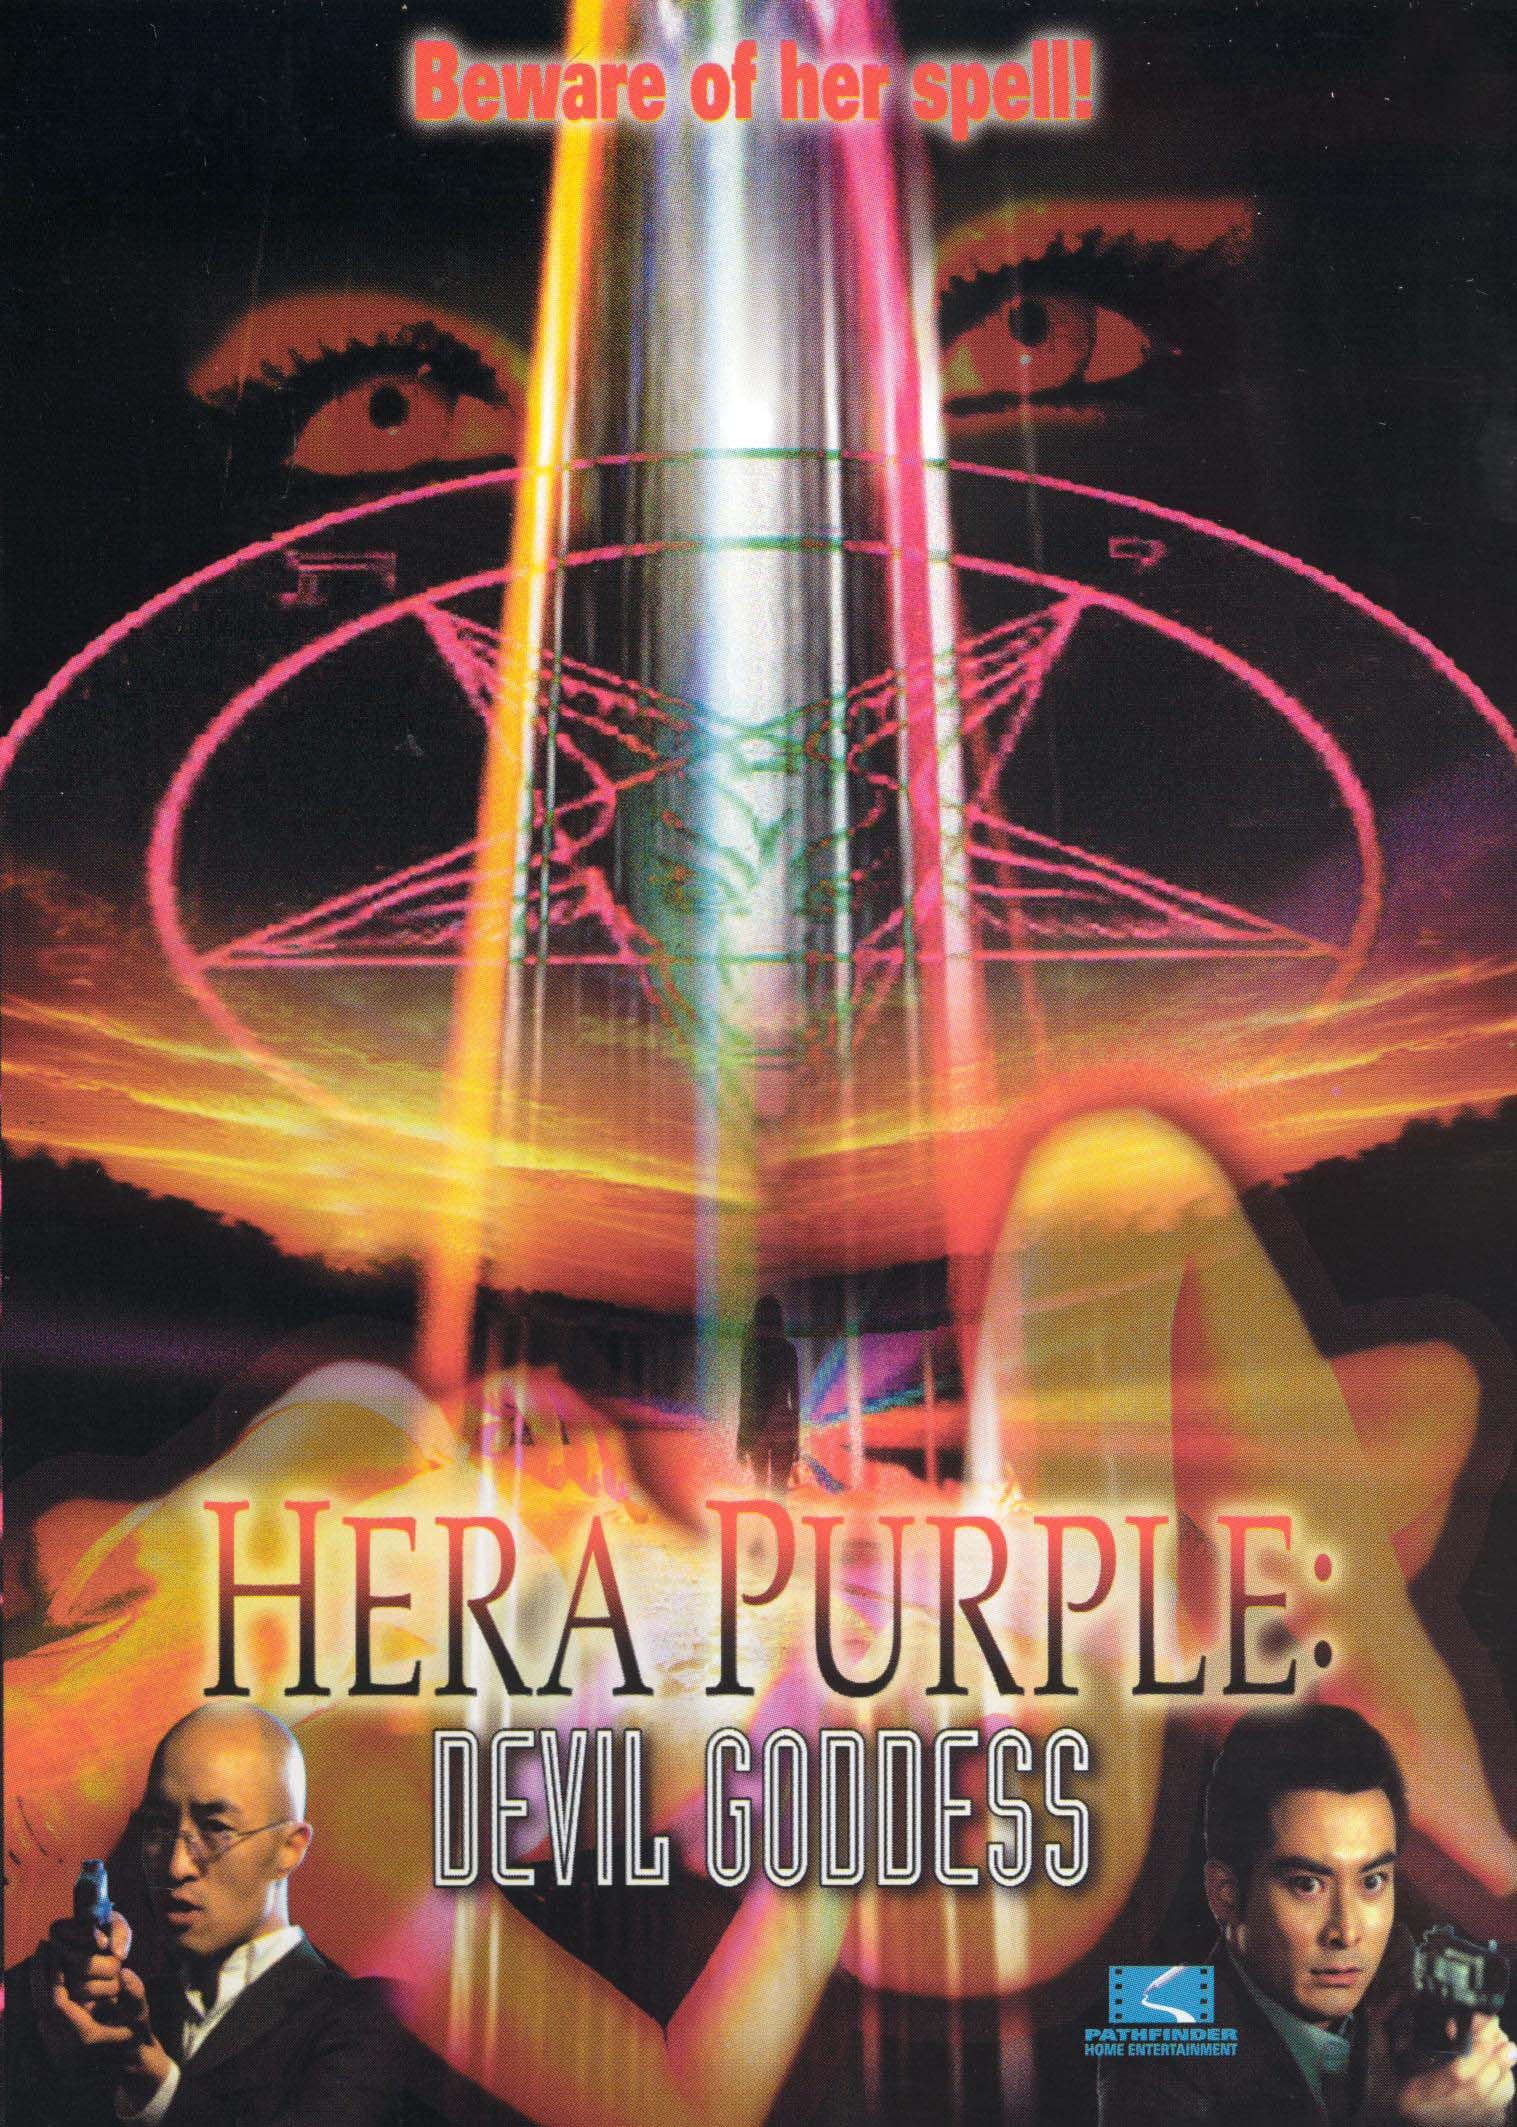 Hera Purple: Devil Goddess